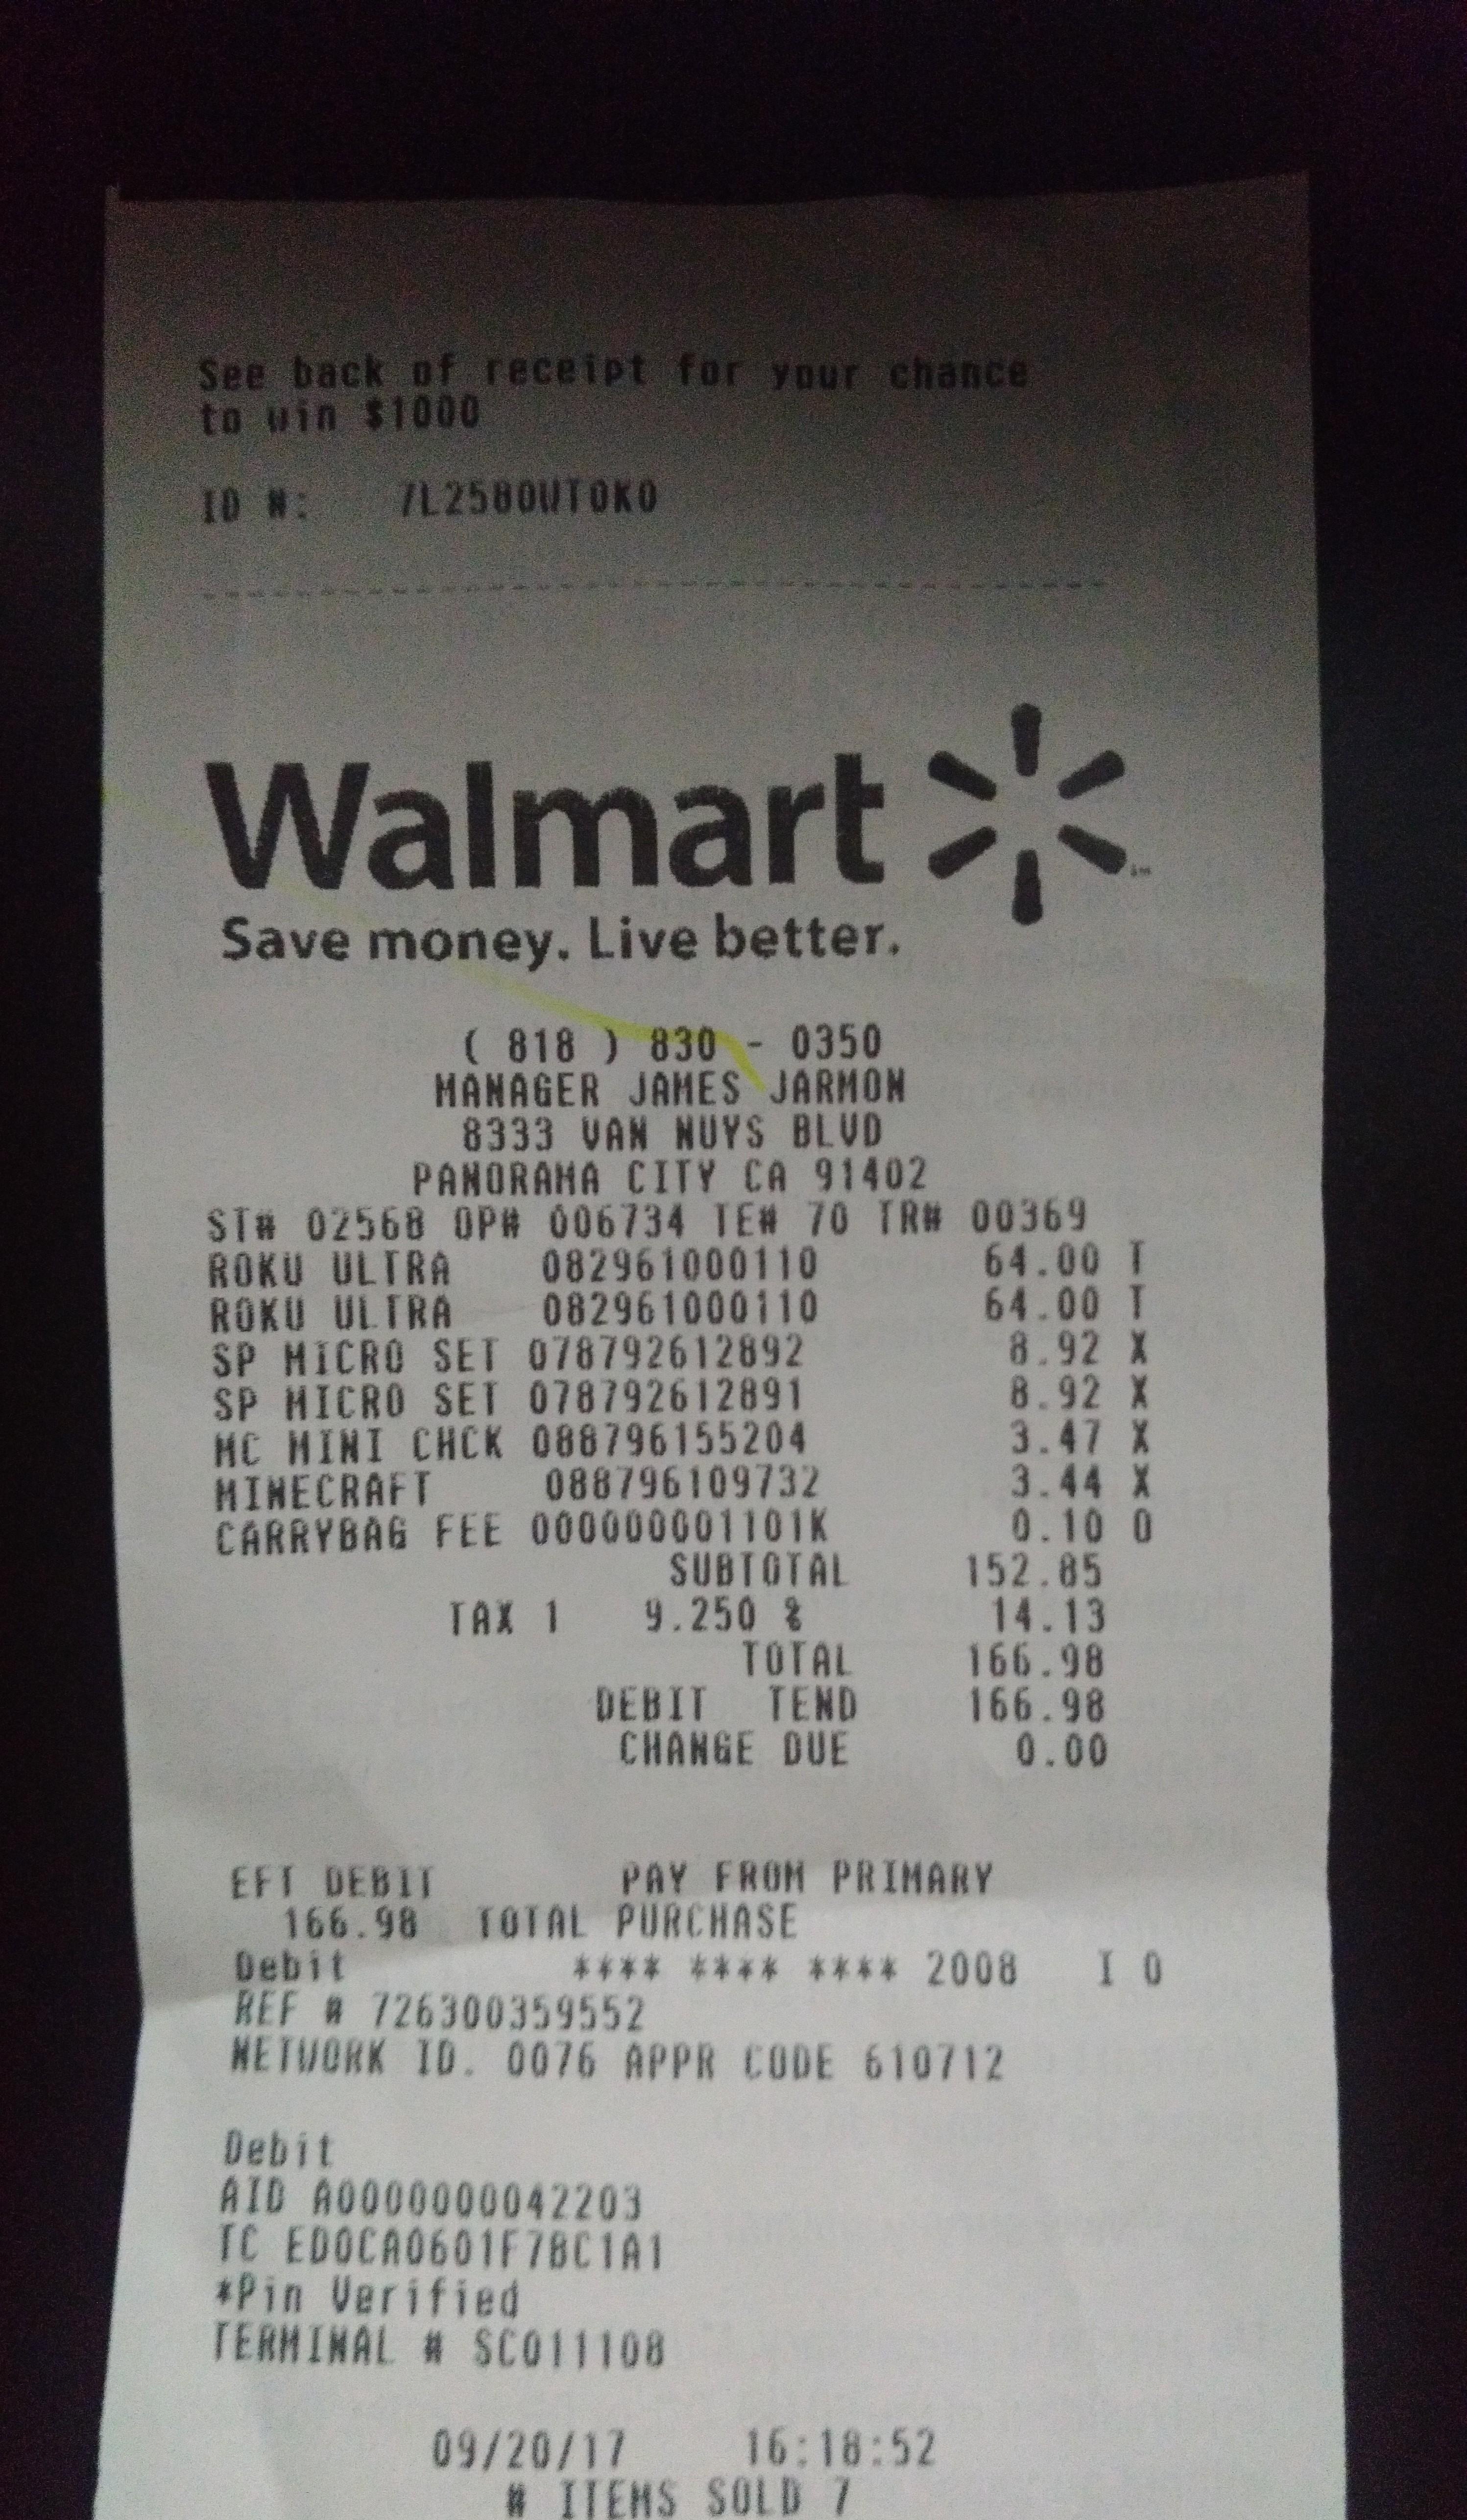 Roku Ultra Walmart Clearance $64 (YMMV)